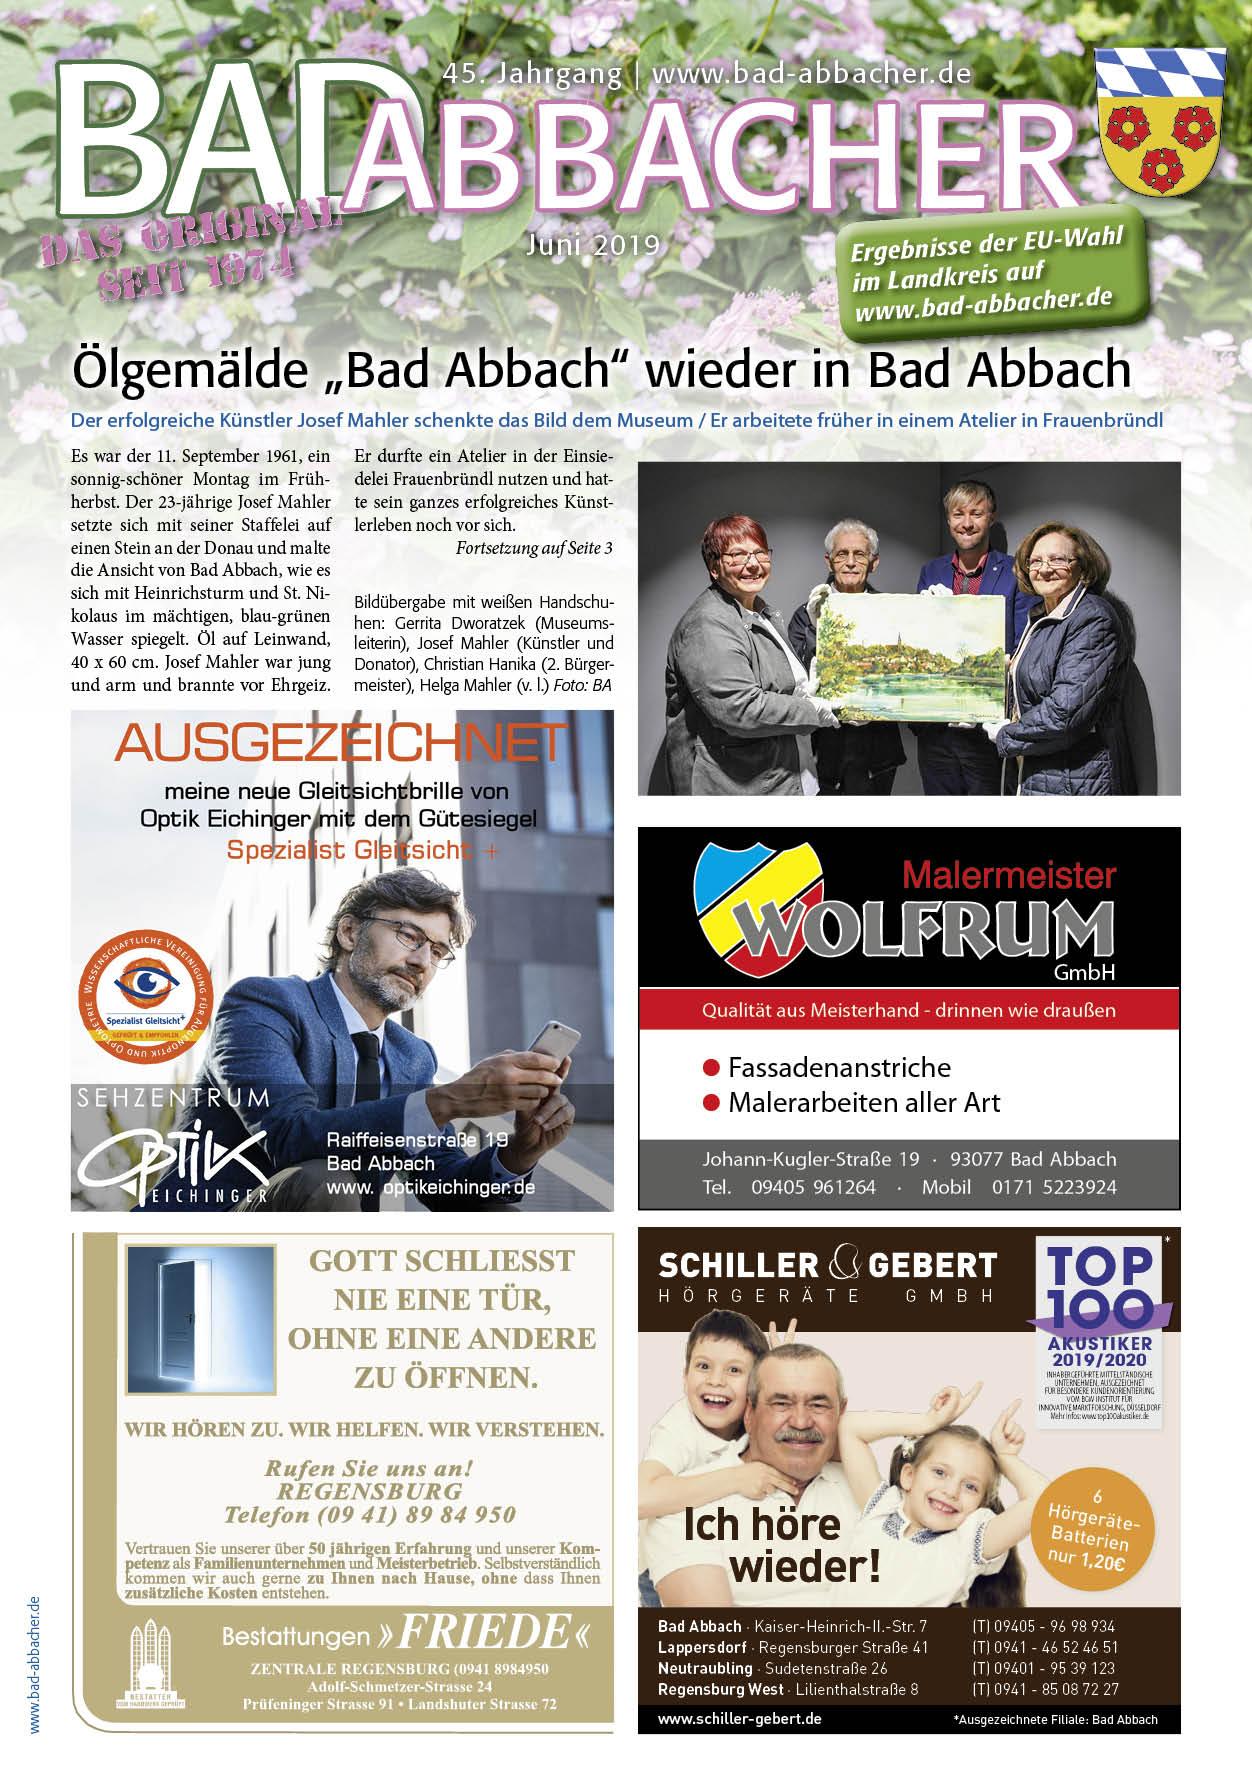 Bad-Abbacher_2019-06